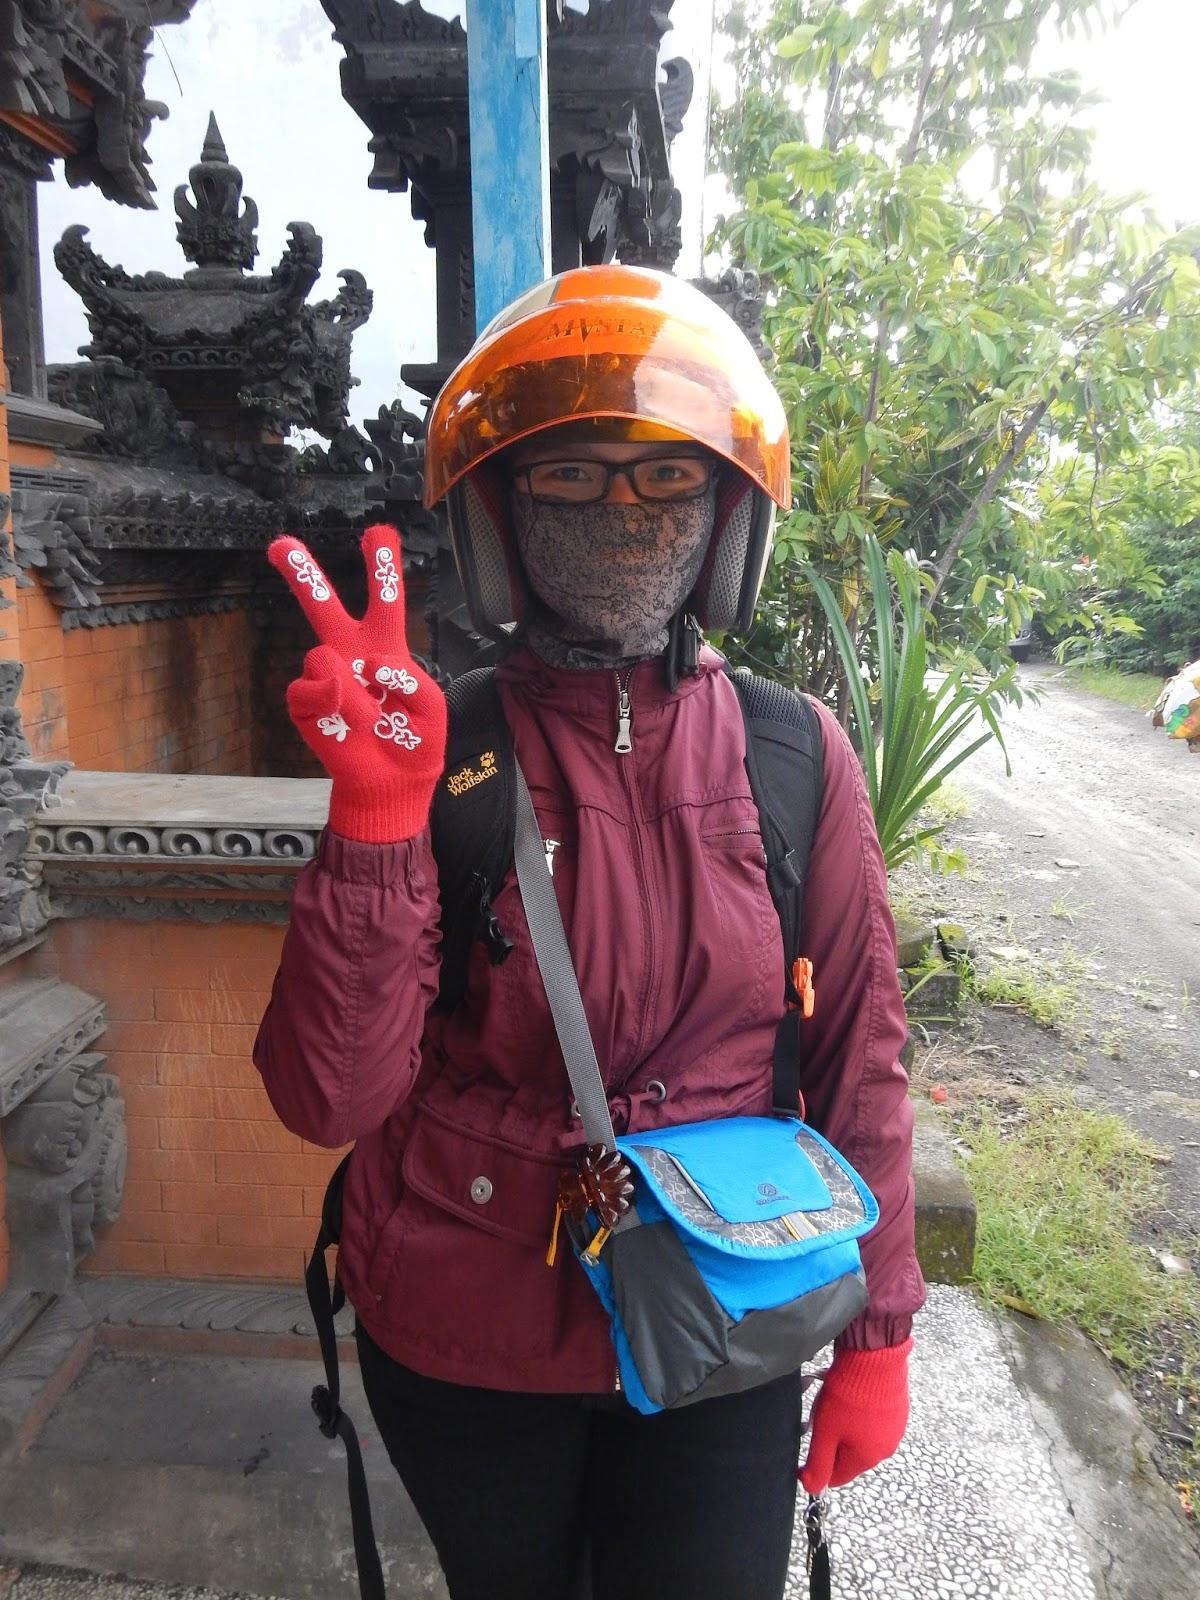 Cerita Pendek Perjalanan By Shafiraira Jalan Jalan Jauh Naik Motor